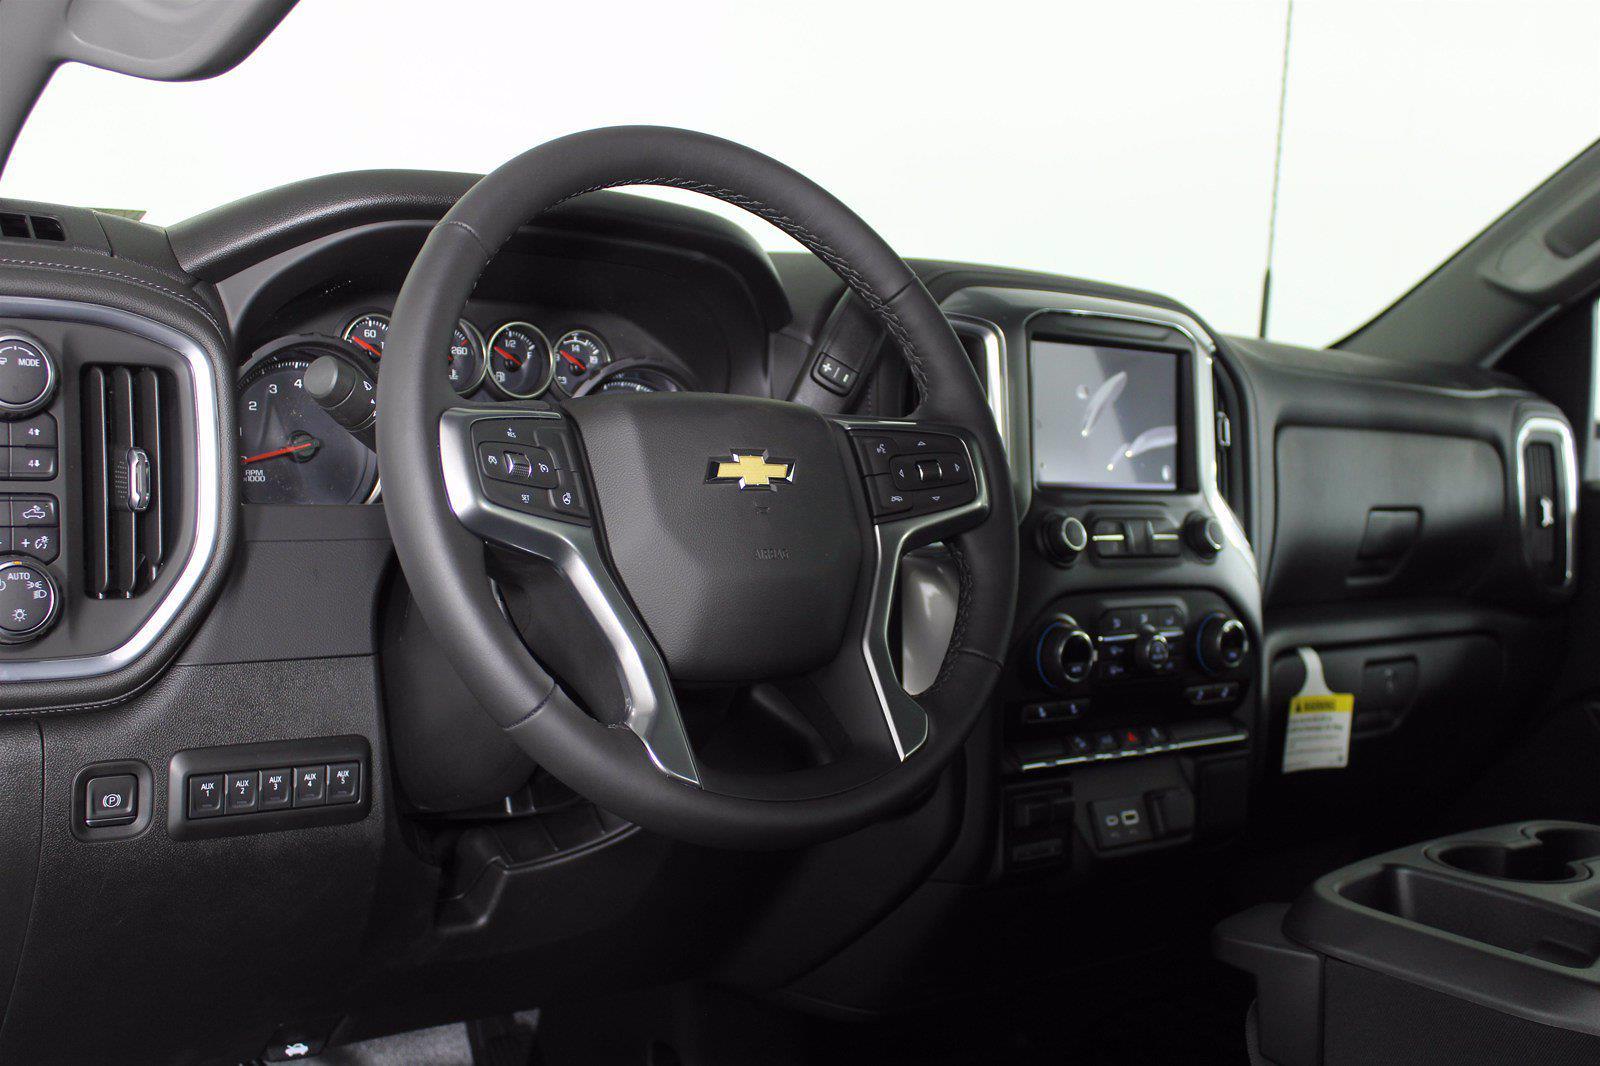 2022 Silverado 2500 Regular Cab 4x4,  Pickup #D120020 - photo 10